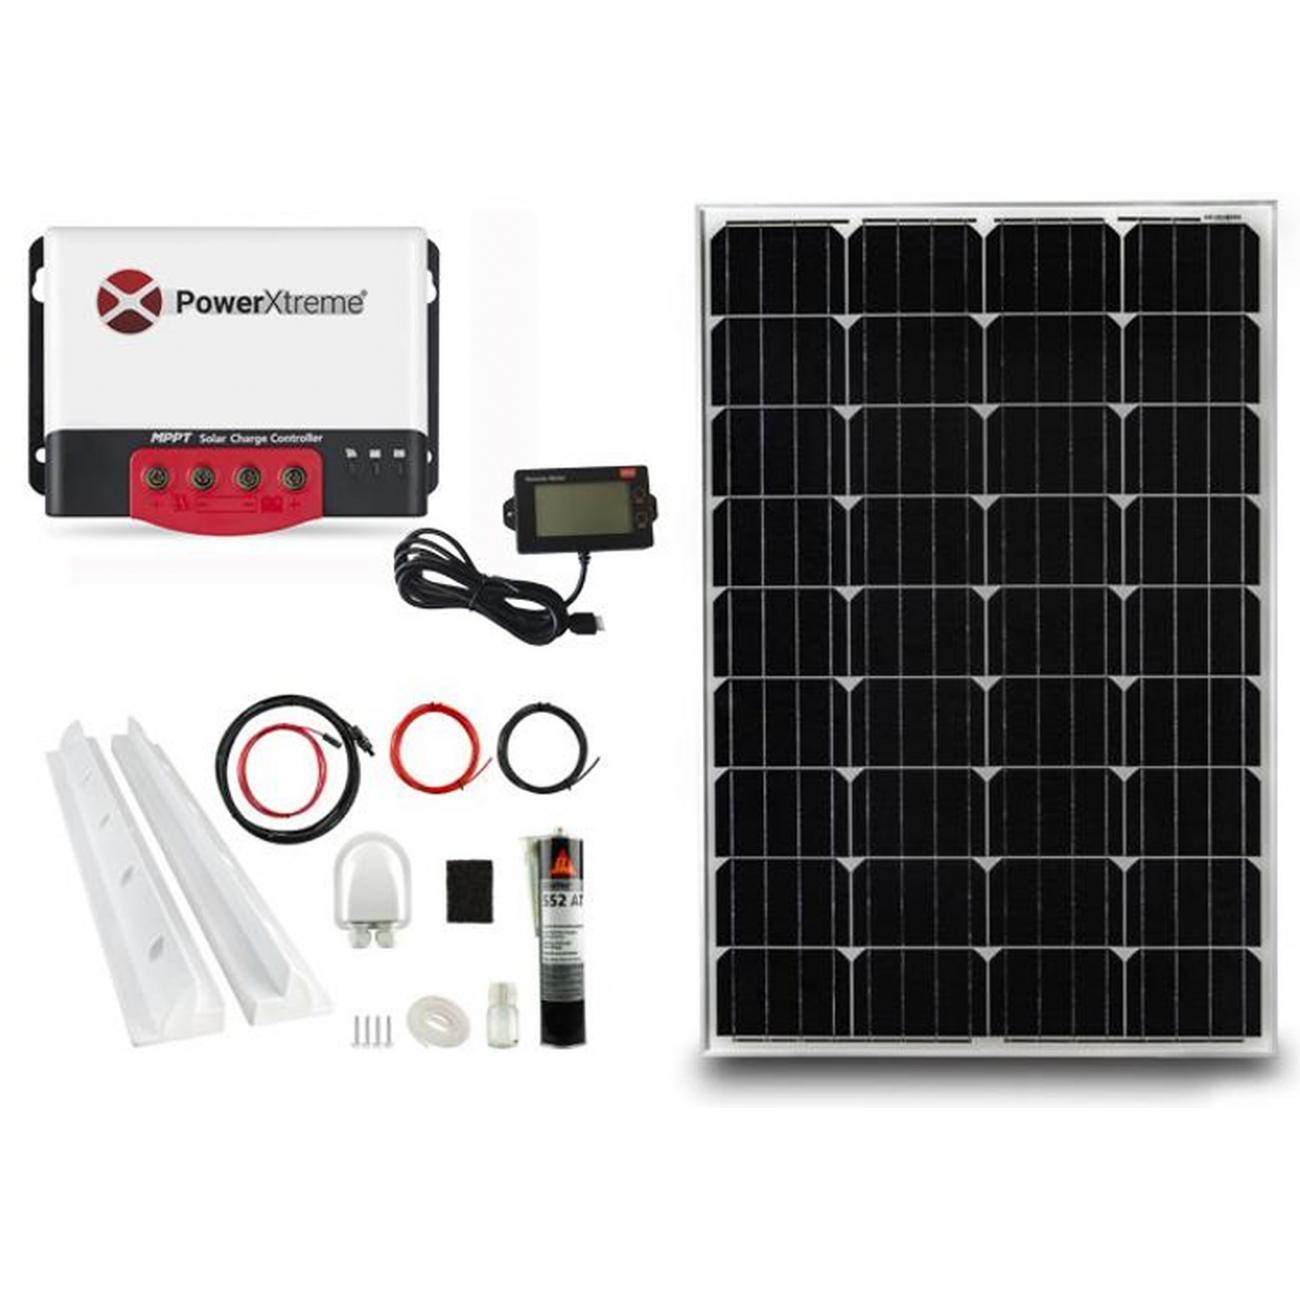 MPPT Solar Laderegler PowerXtreme XS20s Mit Display 200W Paket